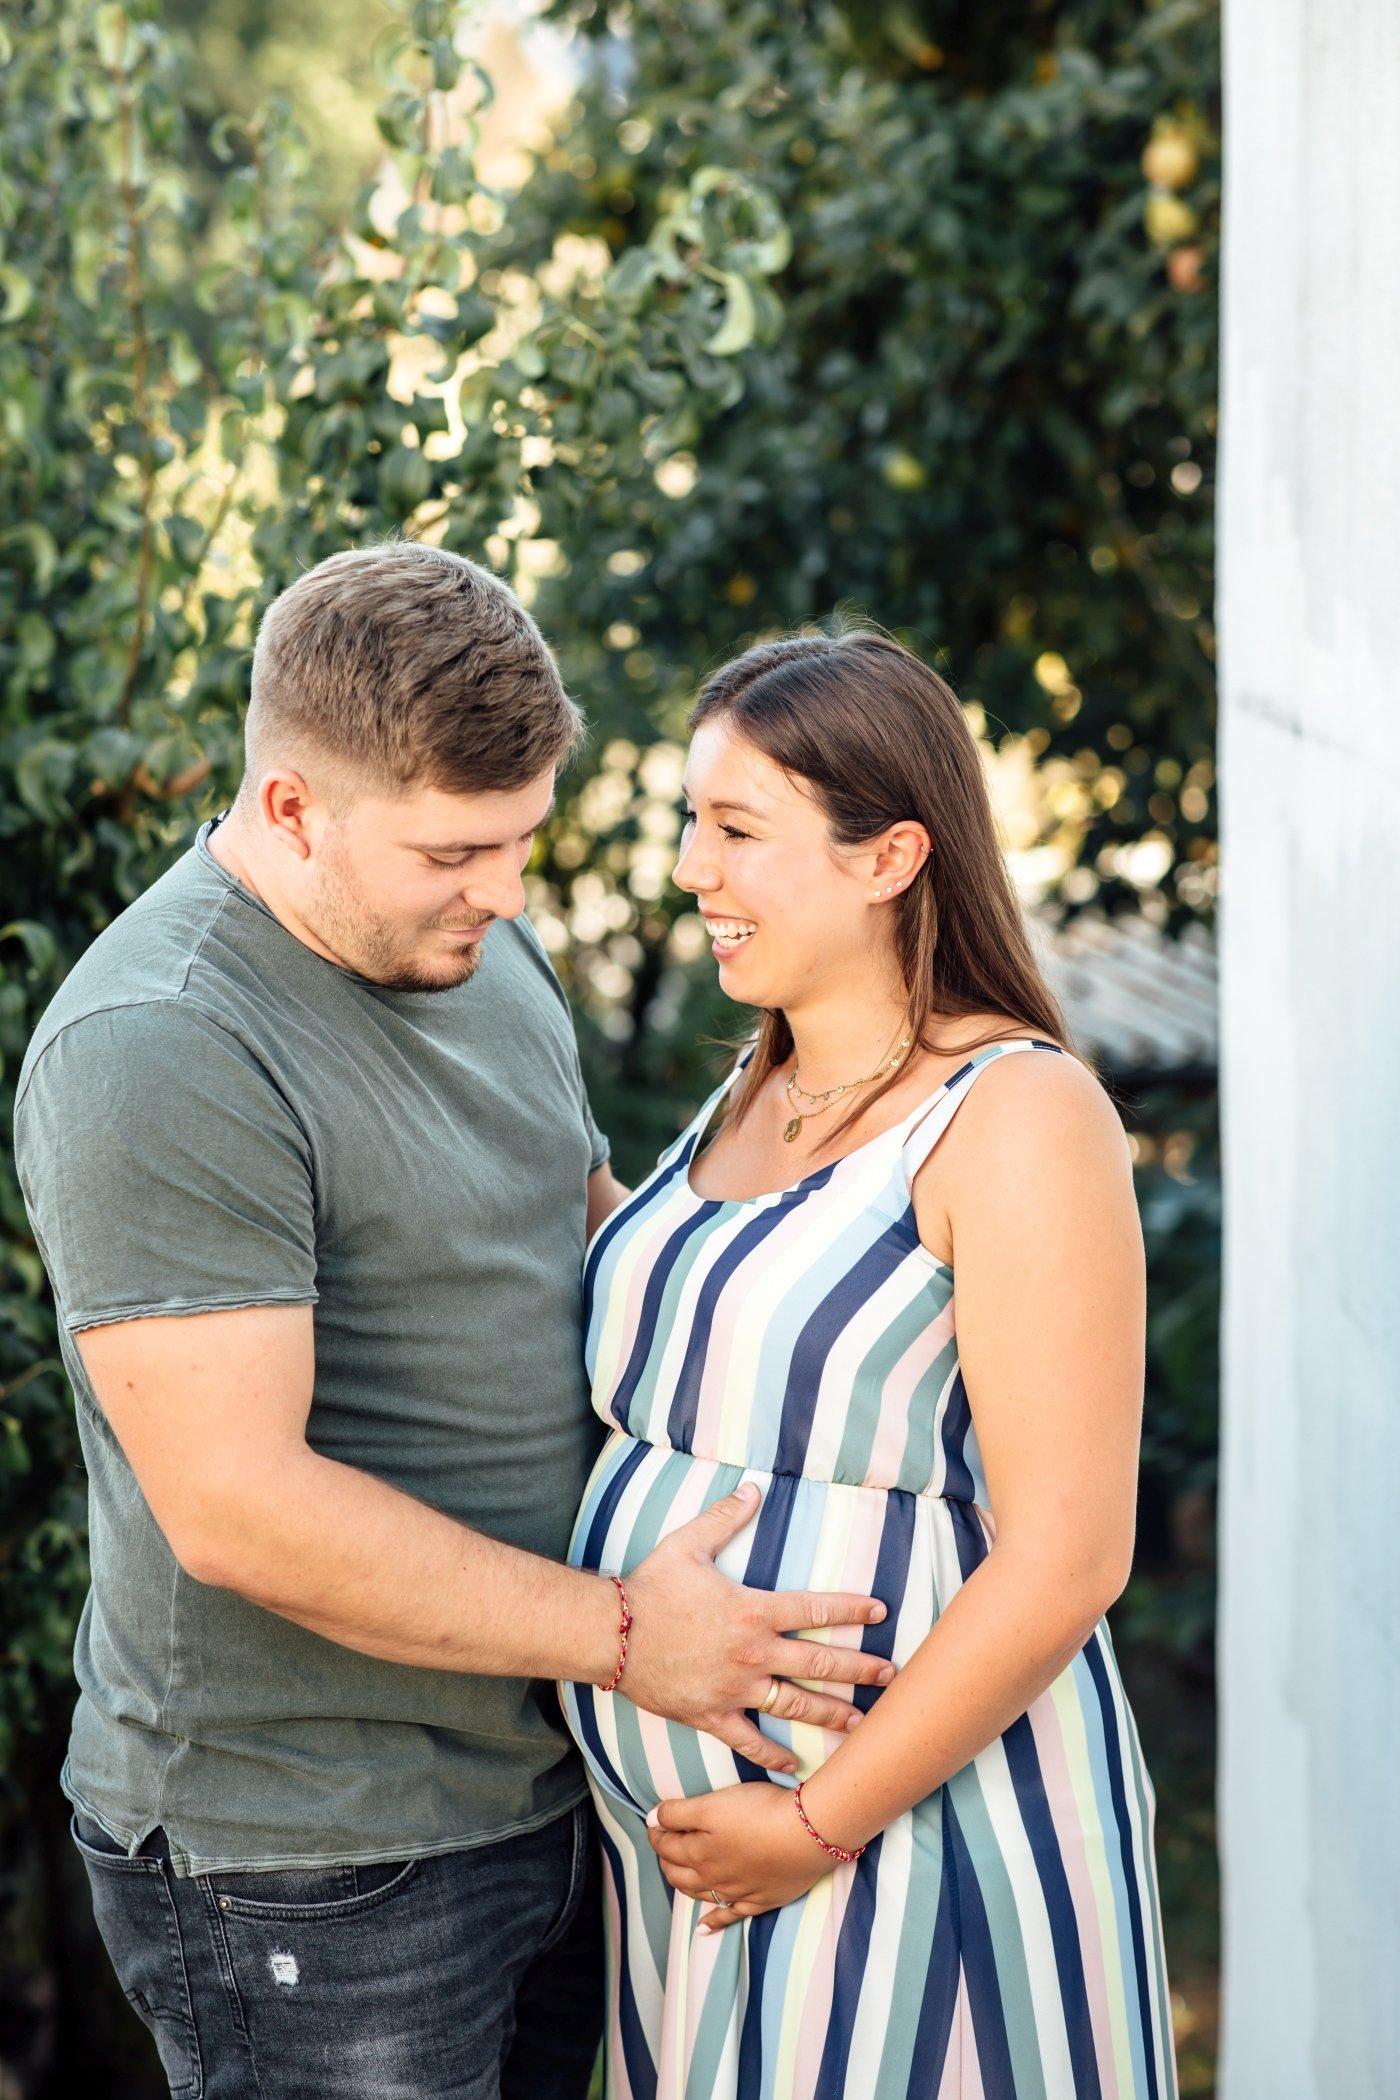 Babybauchfotos-Schwangerschaft-Paarfotos-Homeshooting-Speyer-Landau-Karlsruhe-Babyfotos